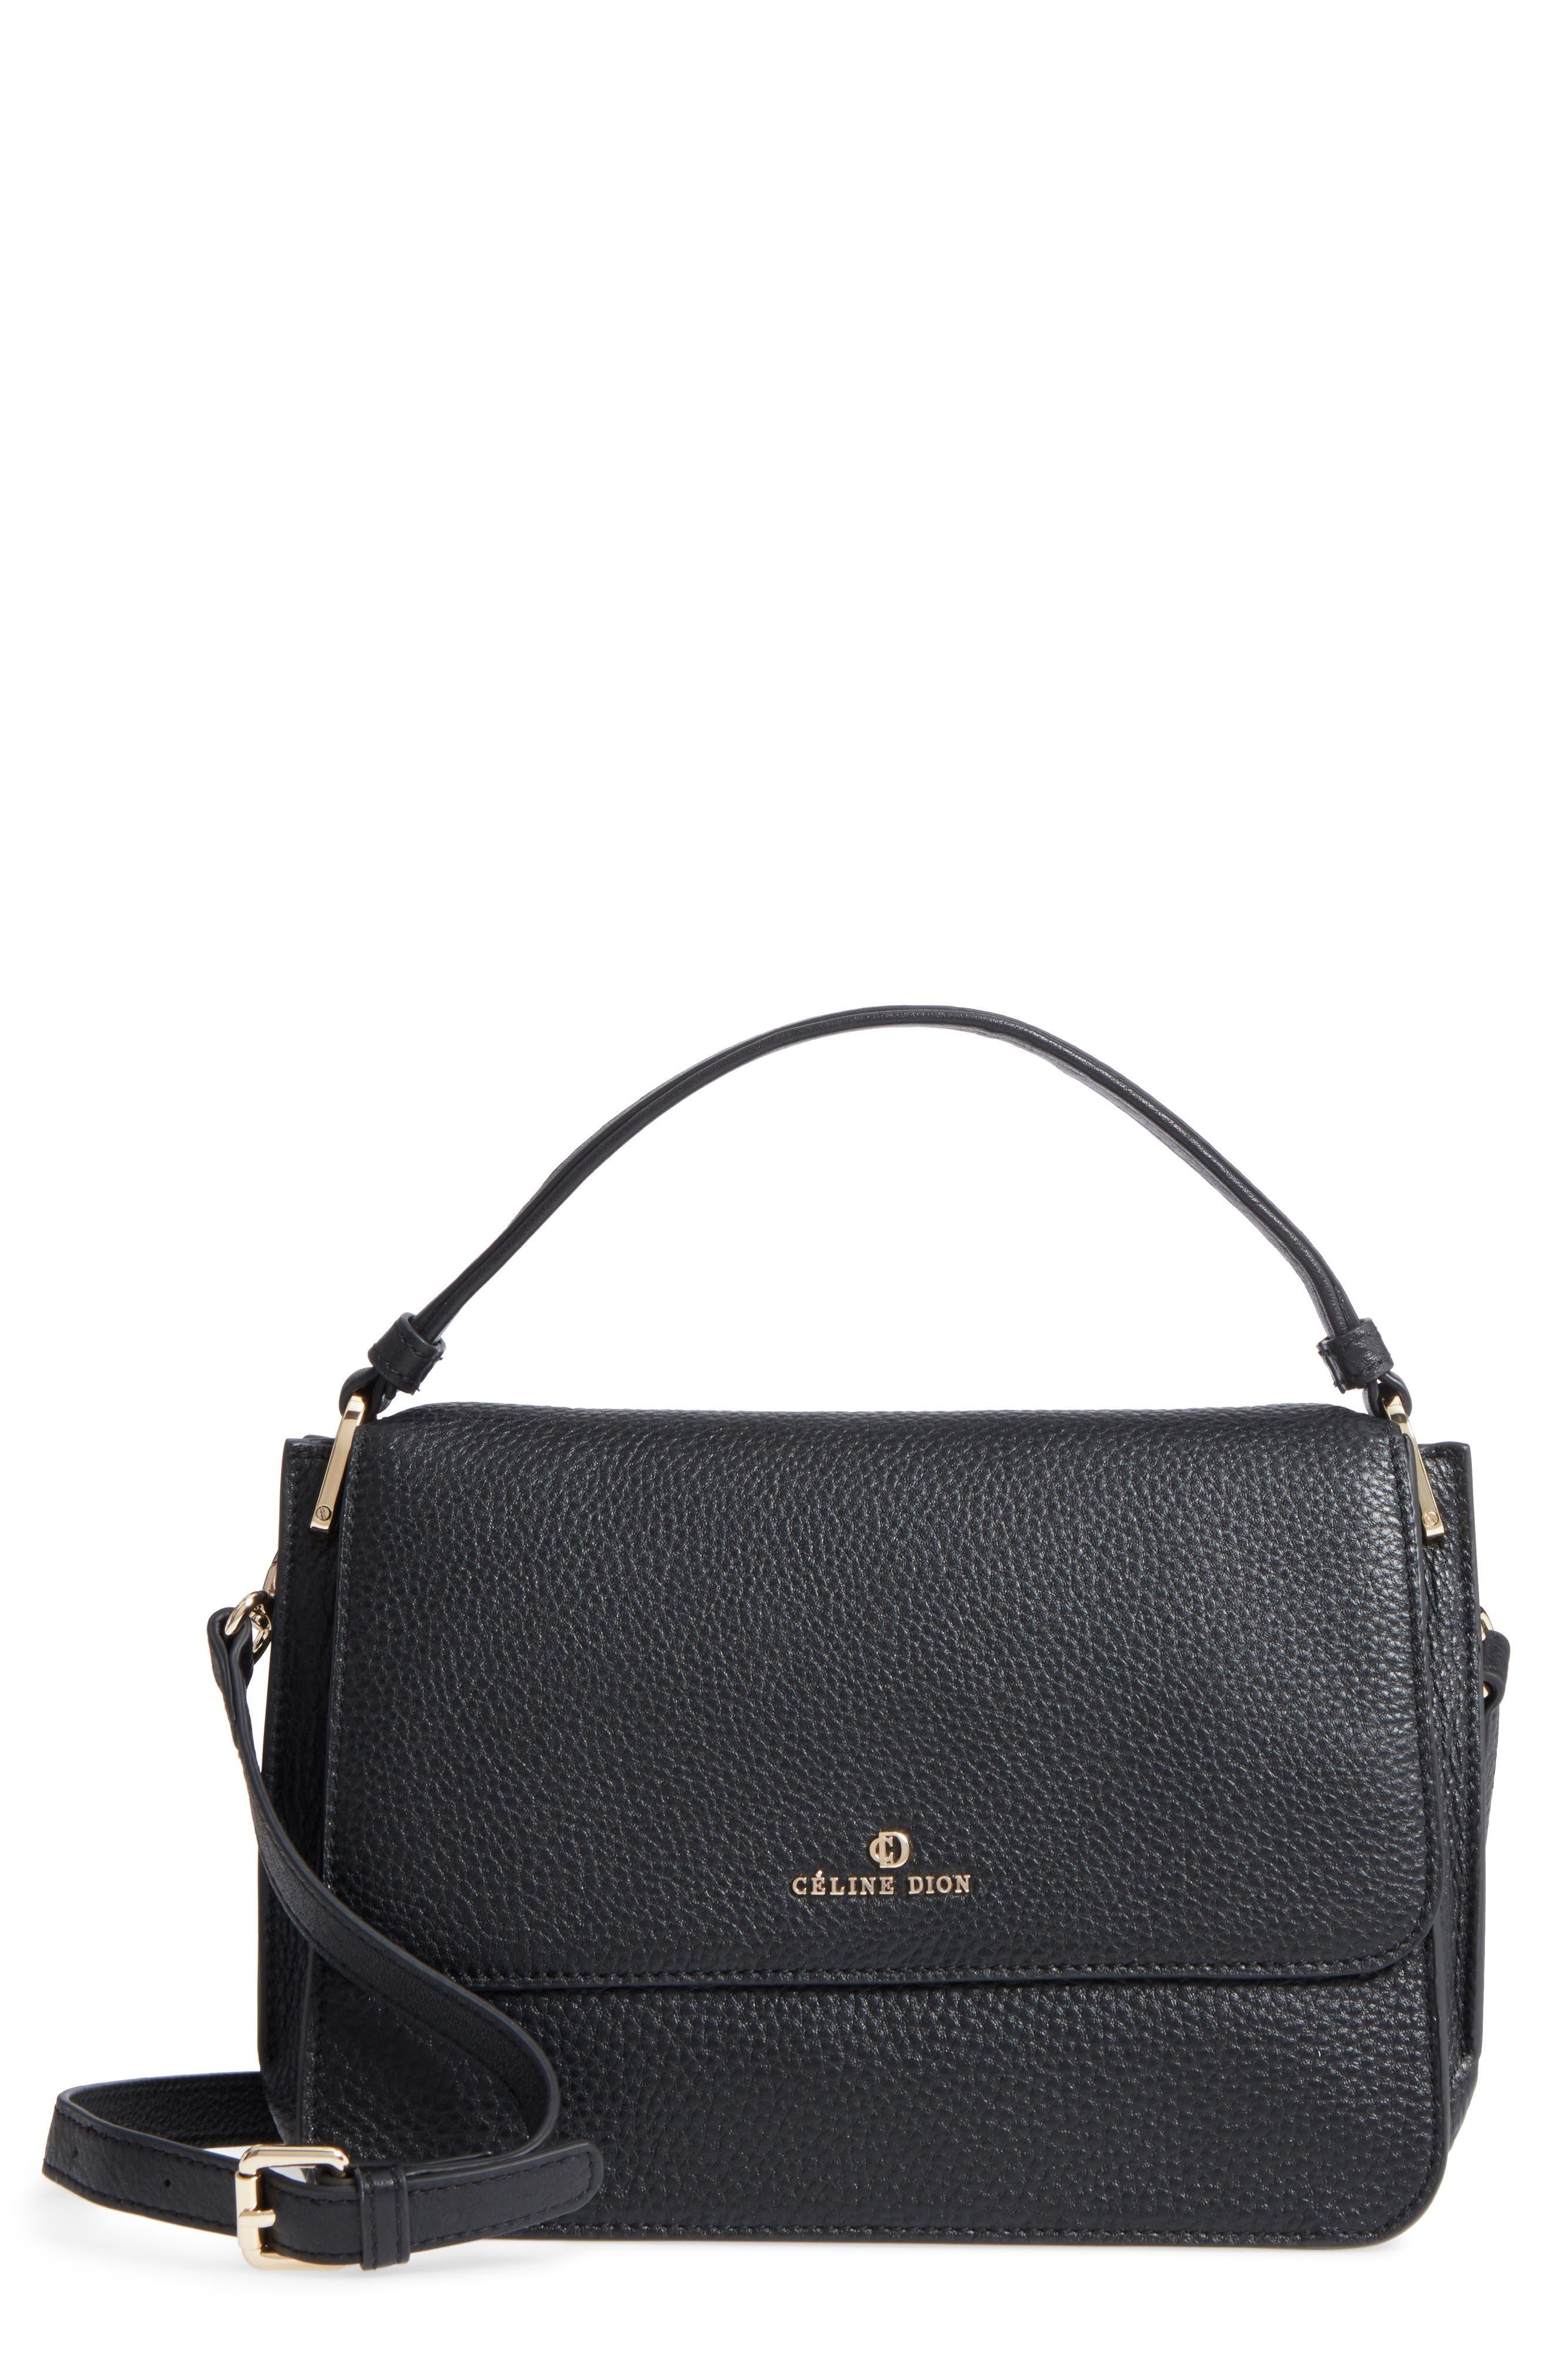 Céline Dion Adagio Leather Satchel,                         Main,                         color, Black